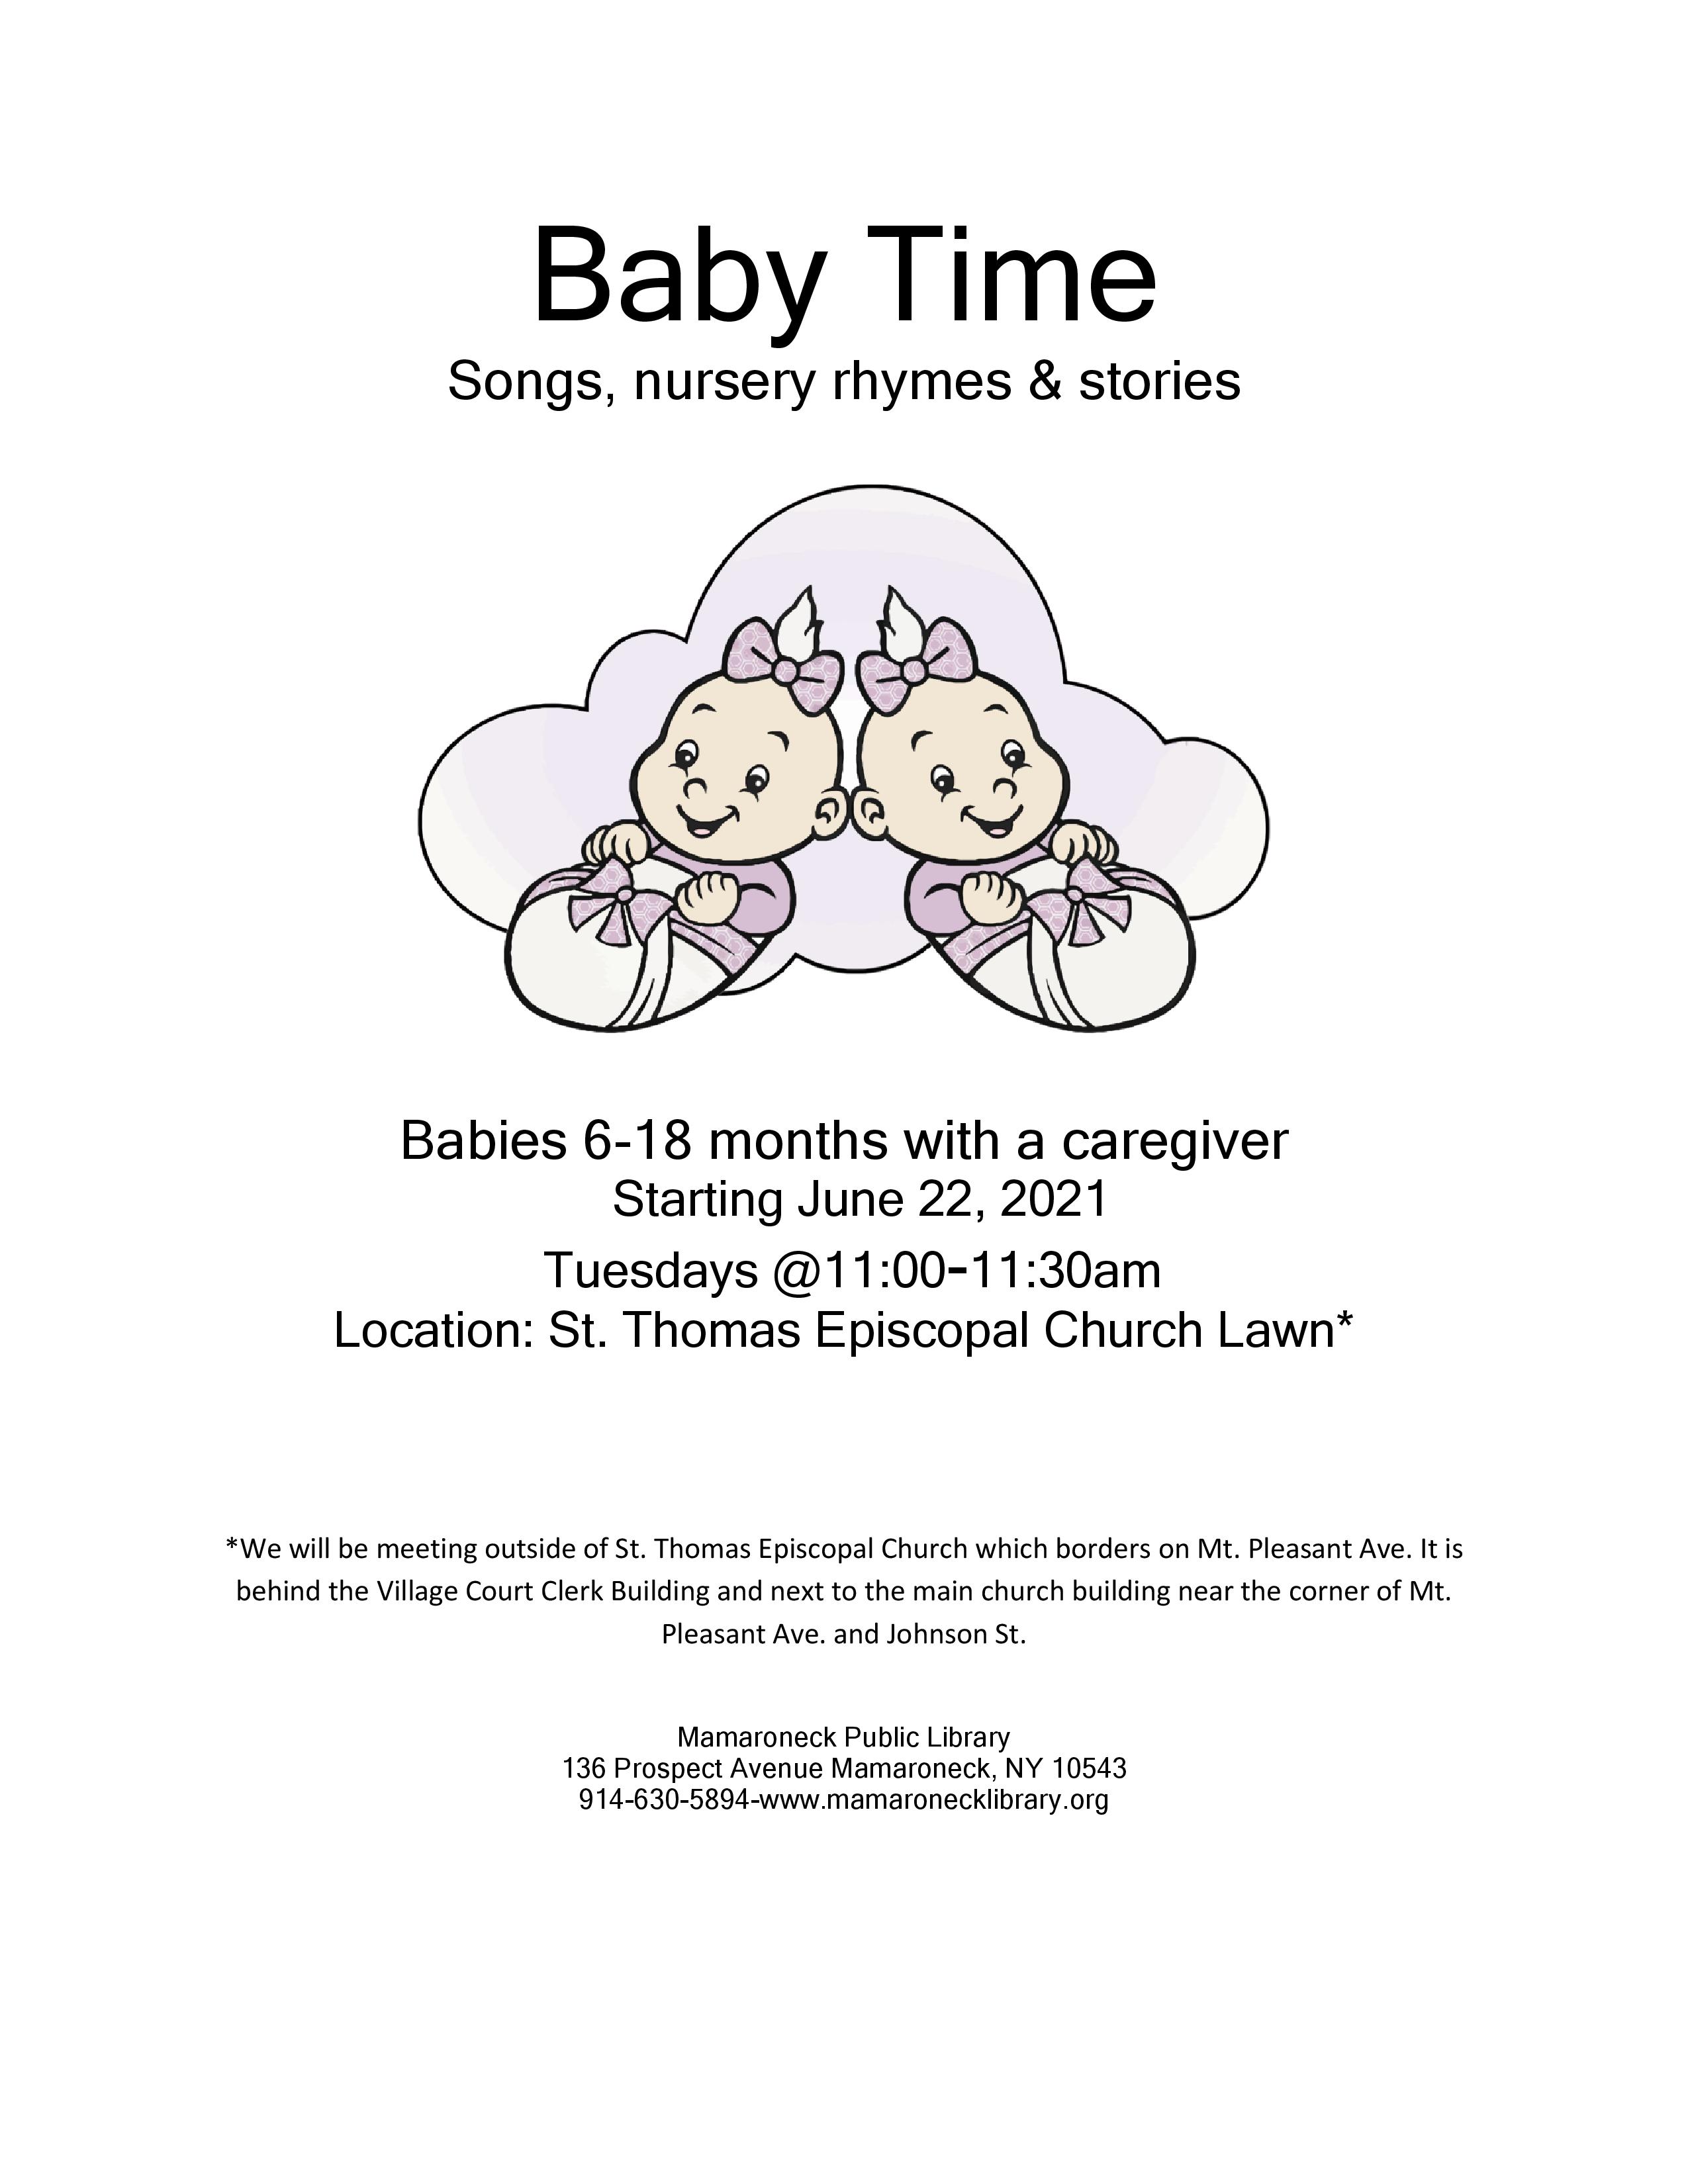 Babytime at St Thomas church no registration